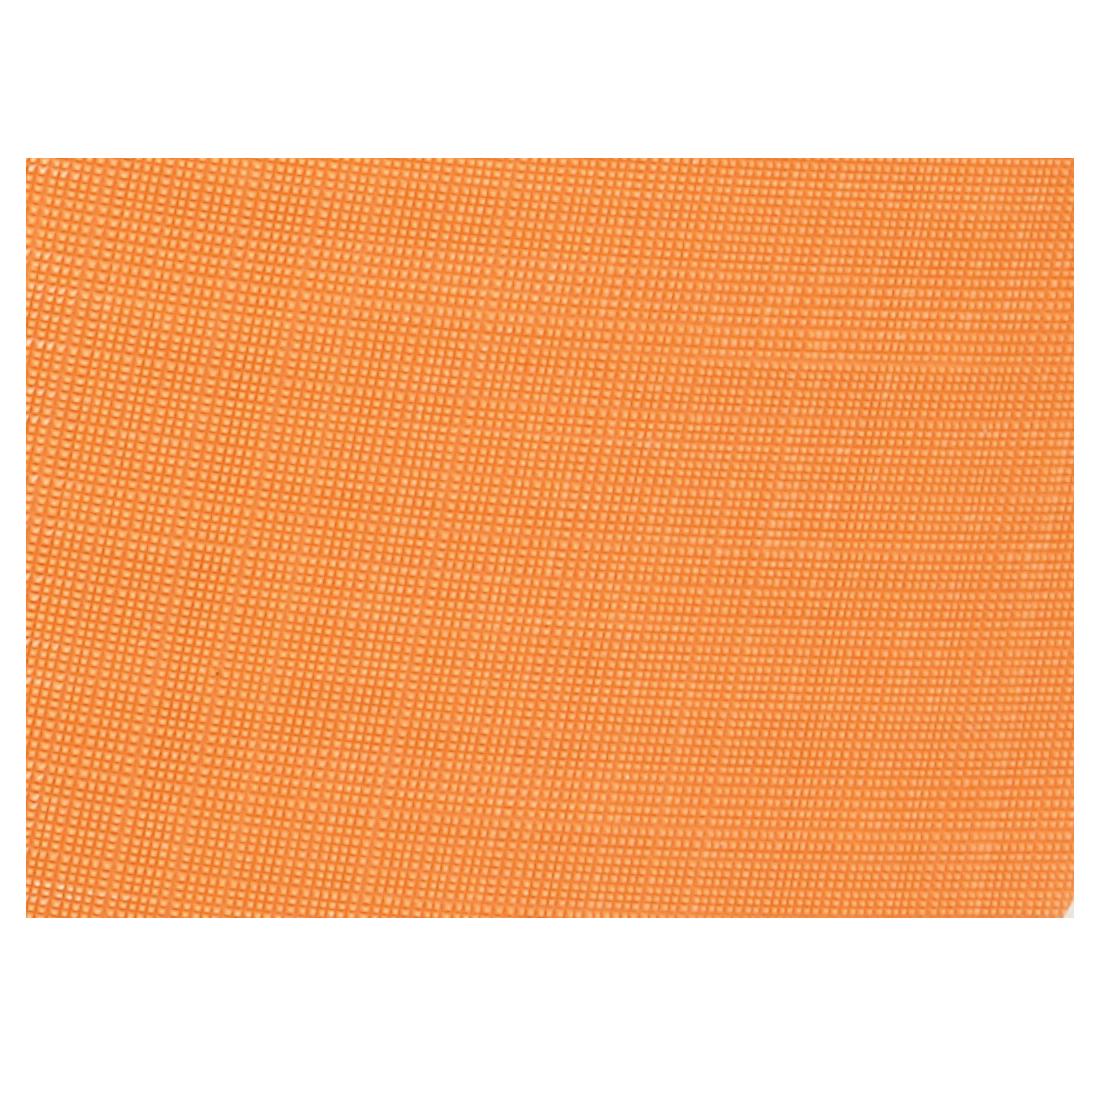 3M™ 051144-14901 Sanding Belt, 2 in W x 72 in L, 15 micron Grit, Aluminum Oxide Abrasive, Polyester Film Backing